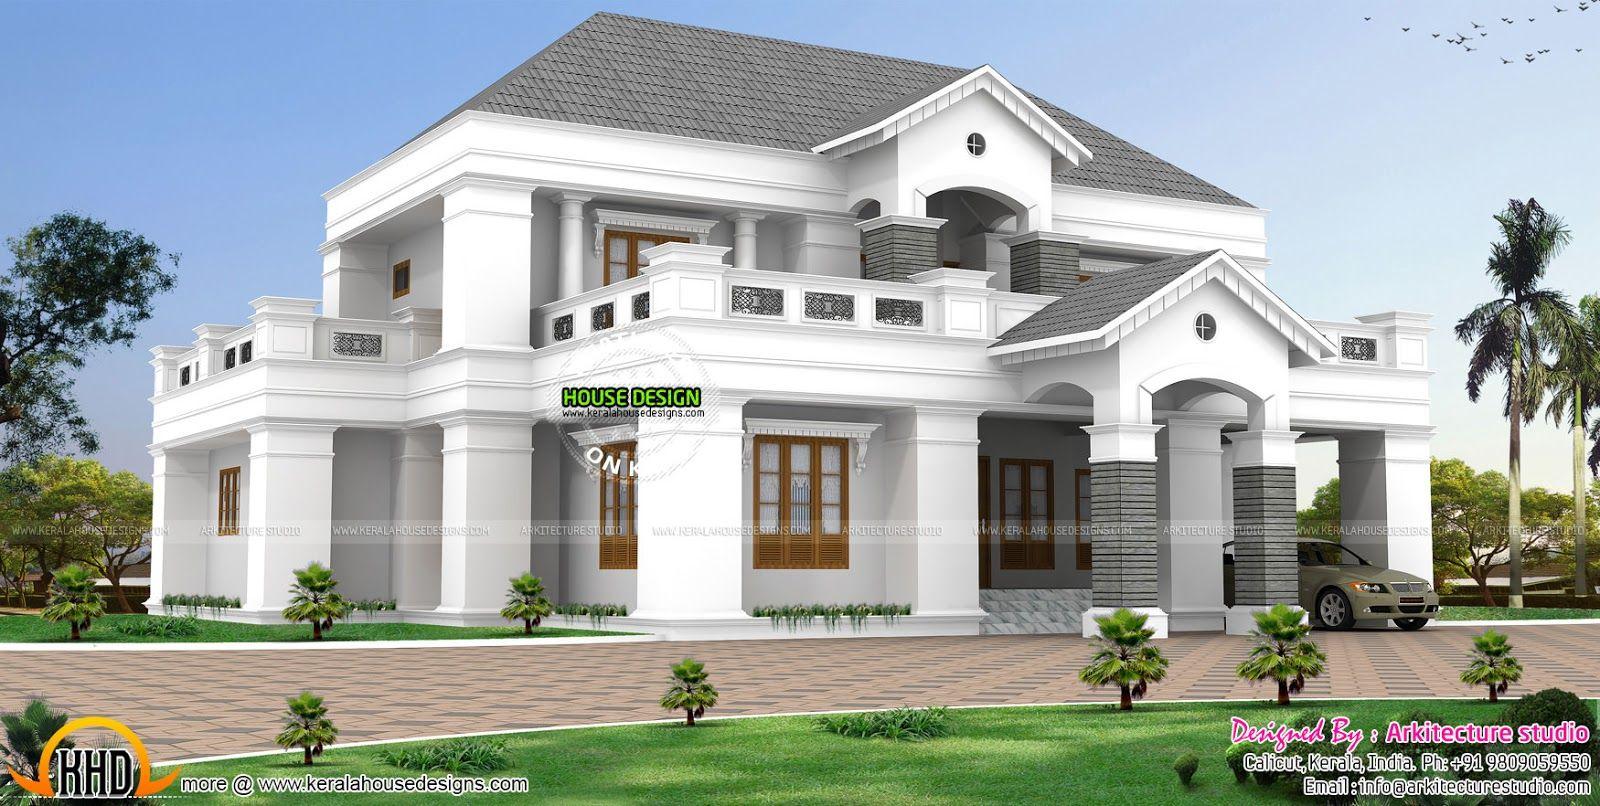 Luxurious pillar type home design kerala floor plans joy studio gallery also rh pinterest